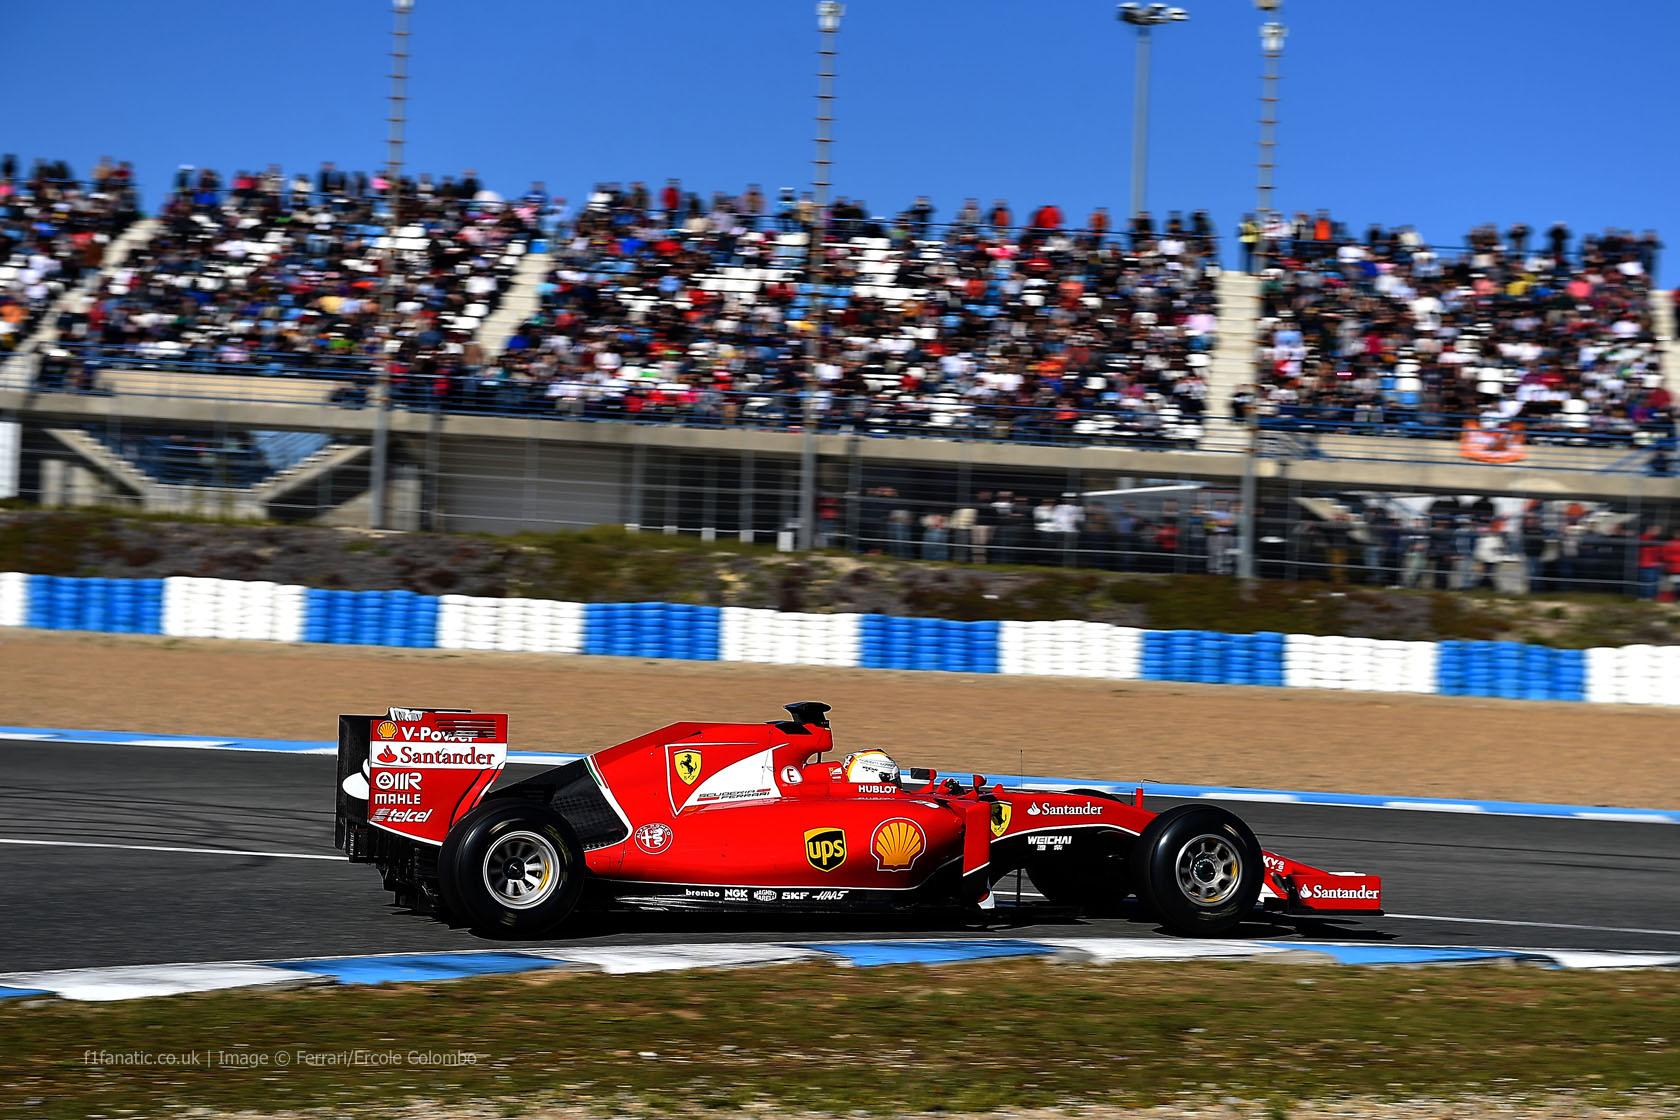 Sebastian Vettel, Ferrari, Circuito de Jerez, 2015